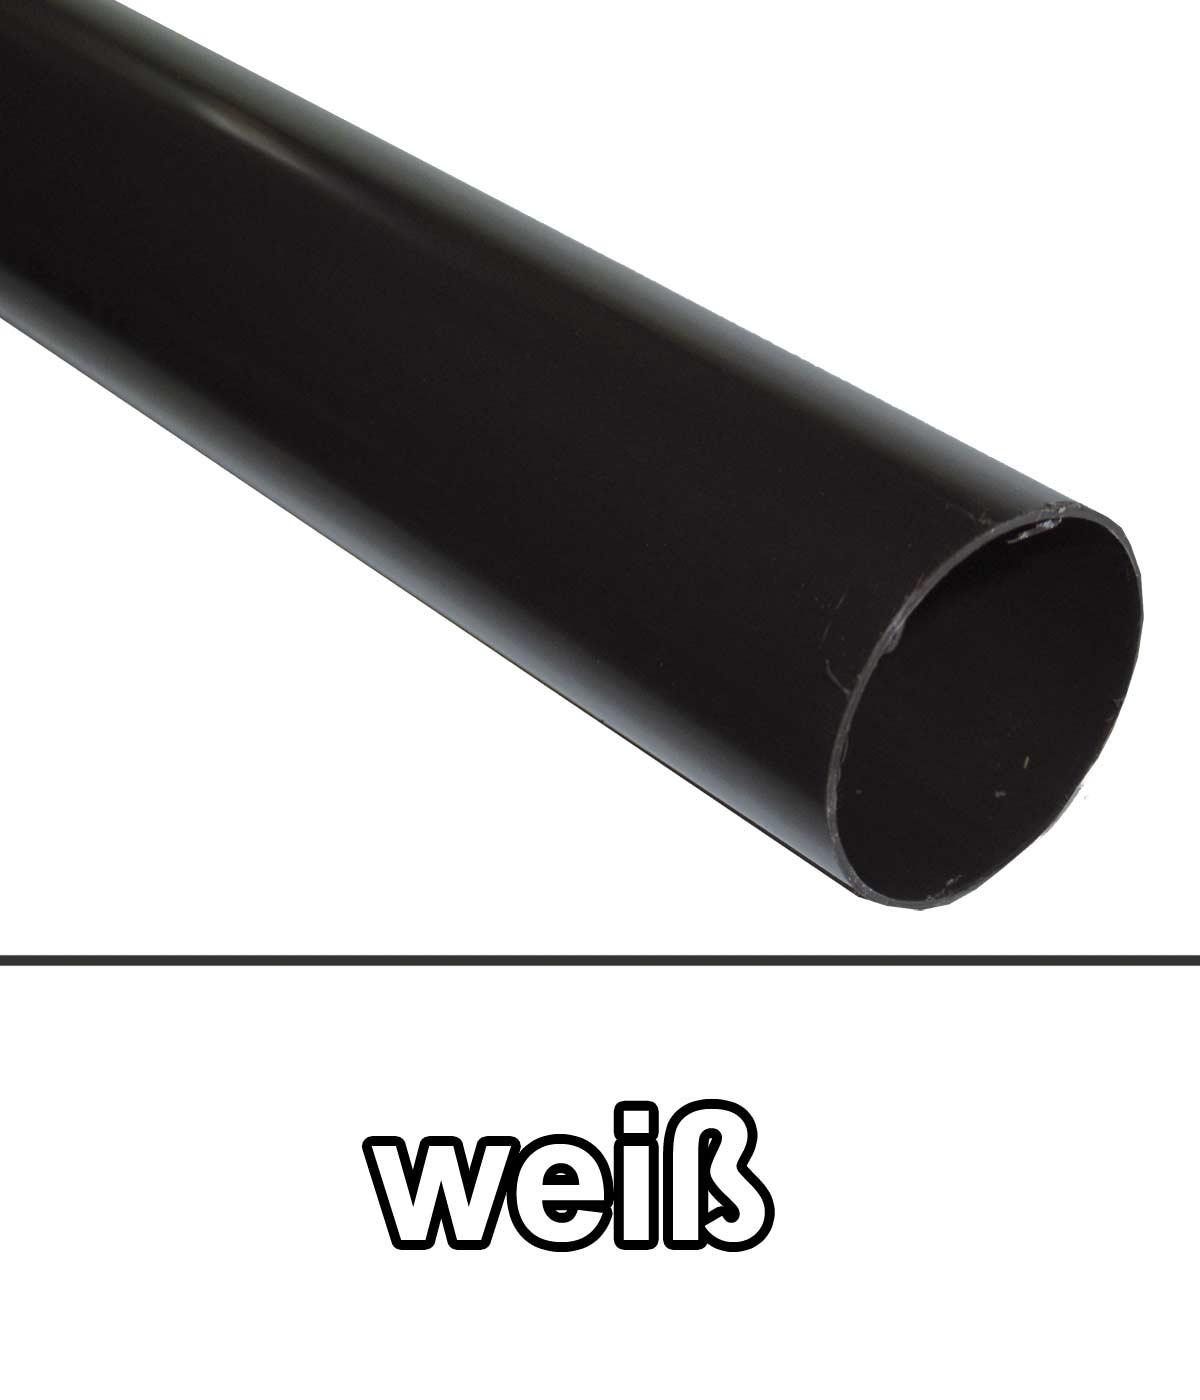 Dachrinnen Fallrohr Ø60mm Länge 100cm PVC weiß Bild 1